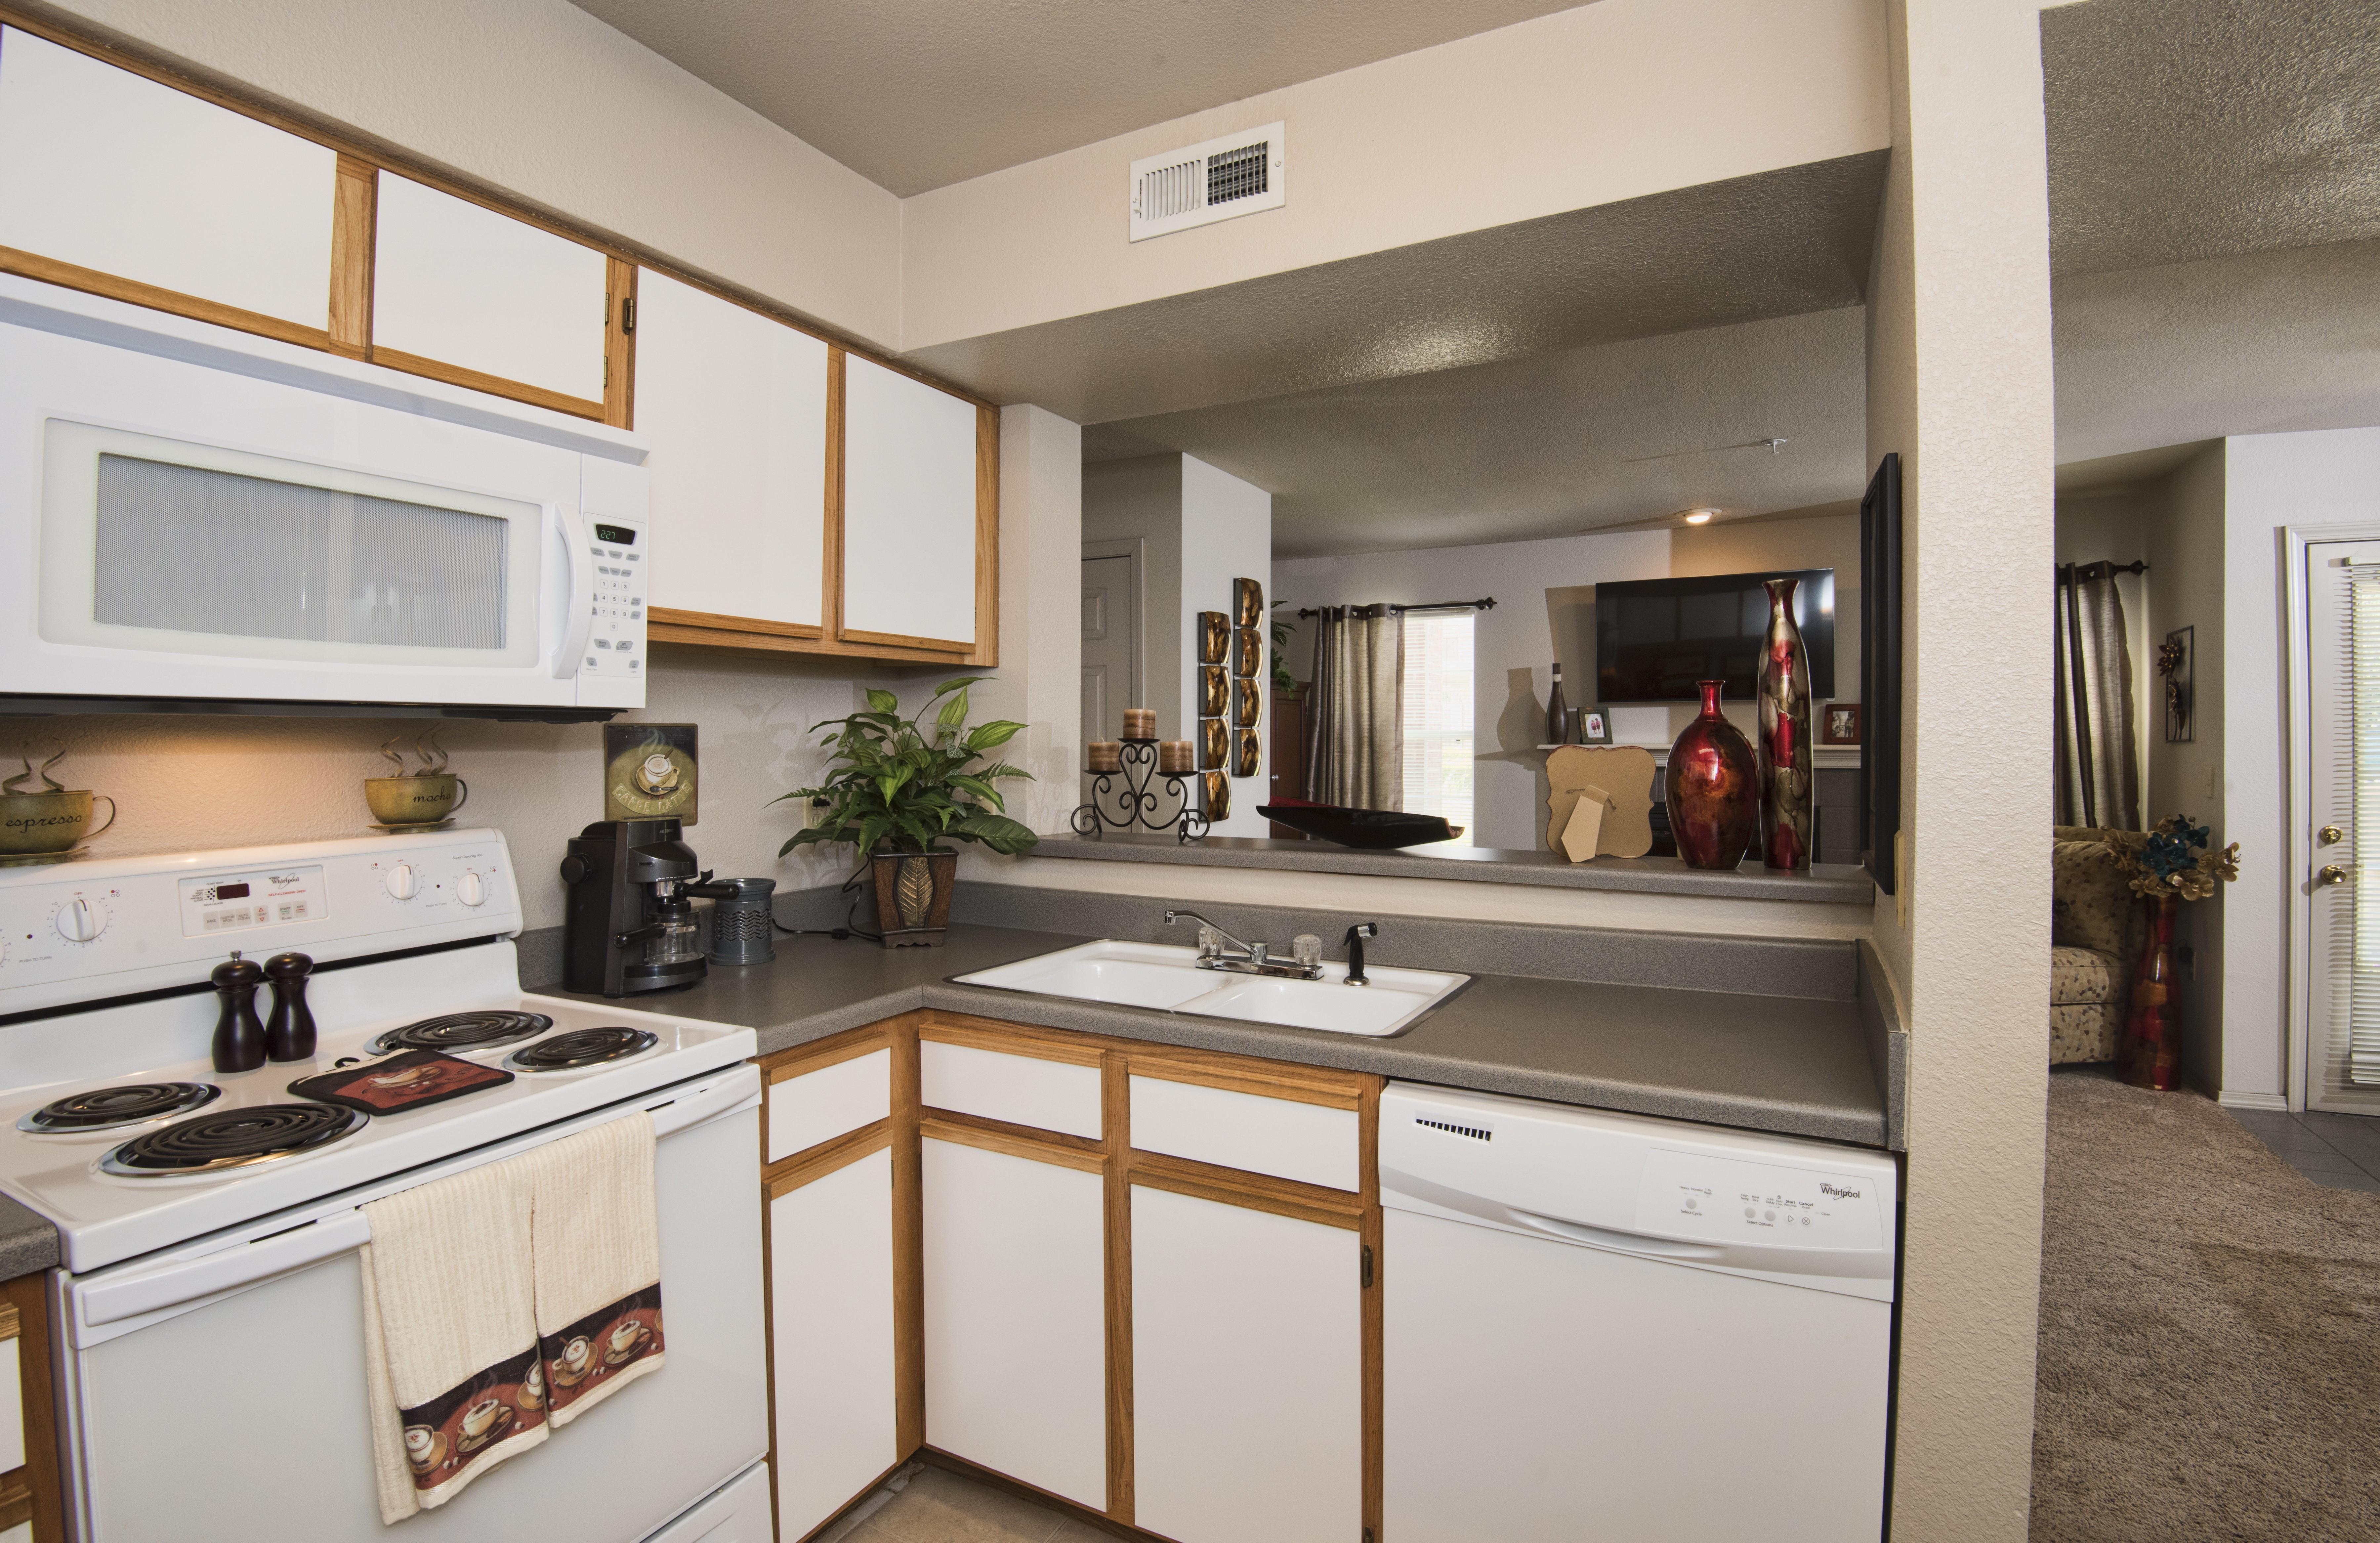 Apartments Near National American University-Wichita Crown Chase Apts for National American University-Wichita Students in Wichita, KS